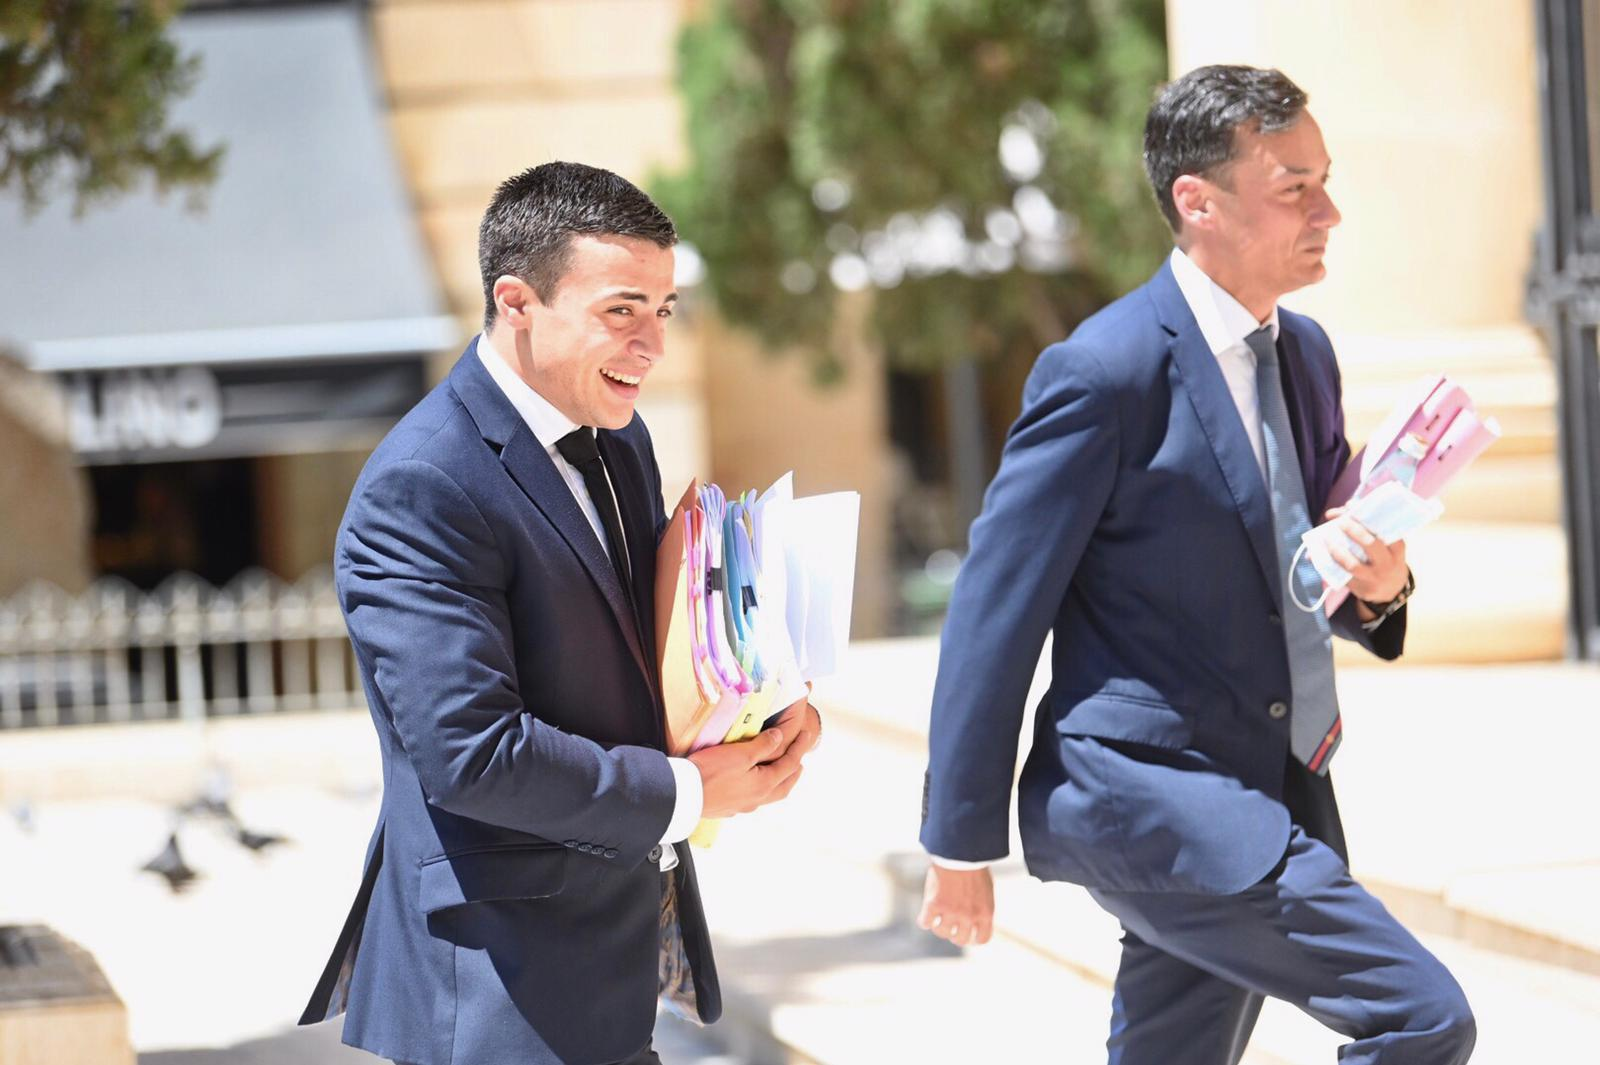 Lawyers Charles Mercieca and Gianluca Caruana Curran walking into court on Thursday. Photo: Mark Zammit Cordina